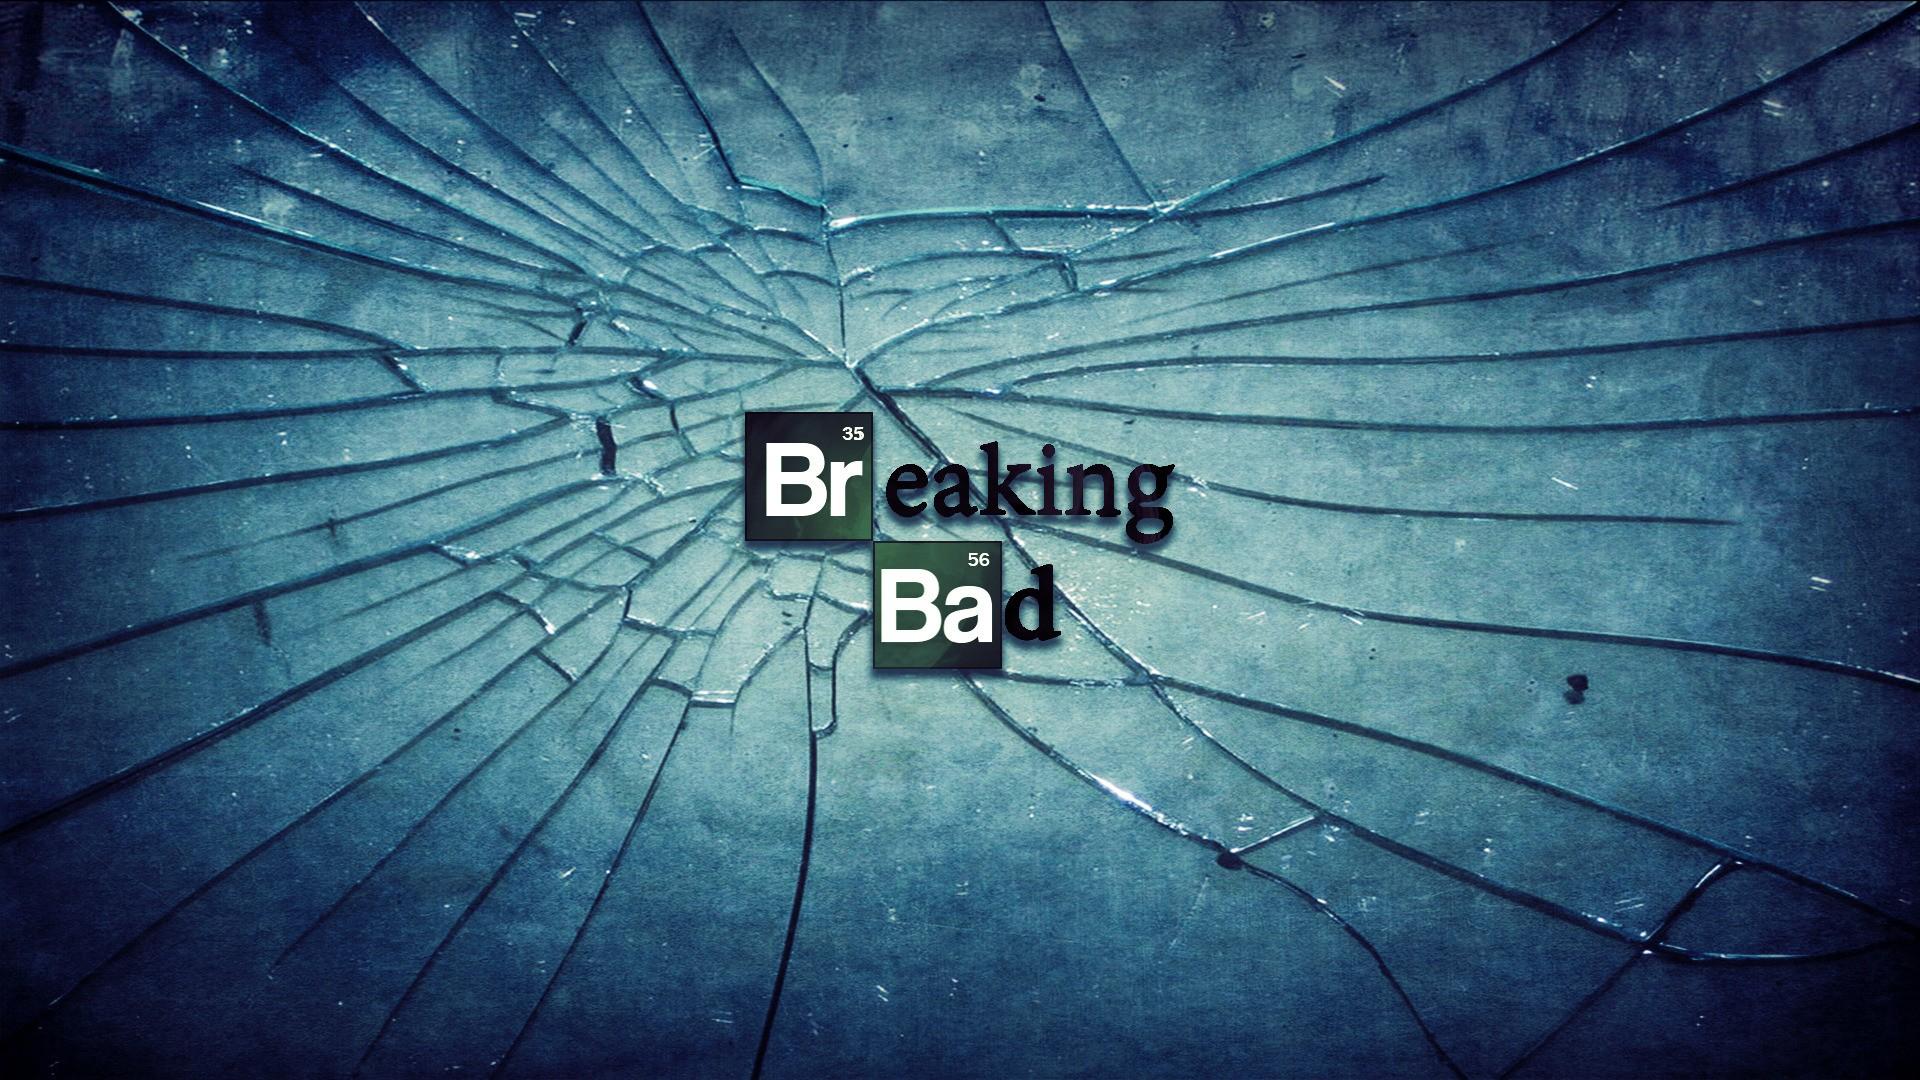 breaking bad, meth - wallpaper #99435 (1920x1080px) on wallls